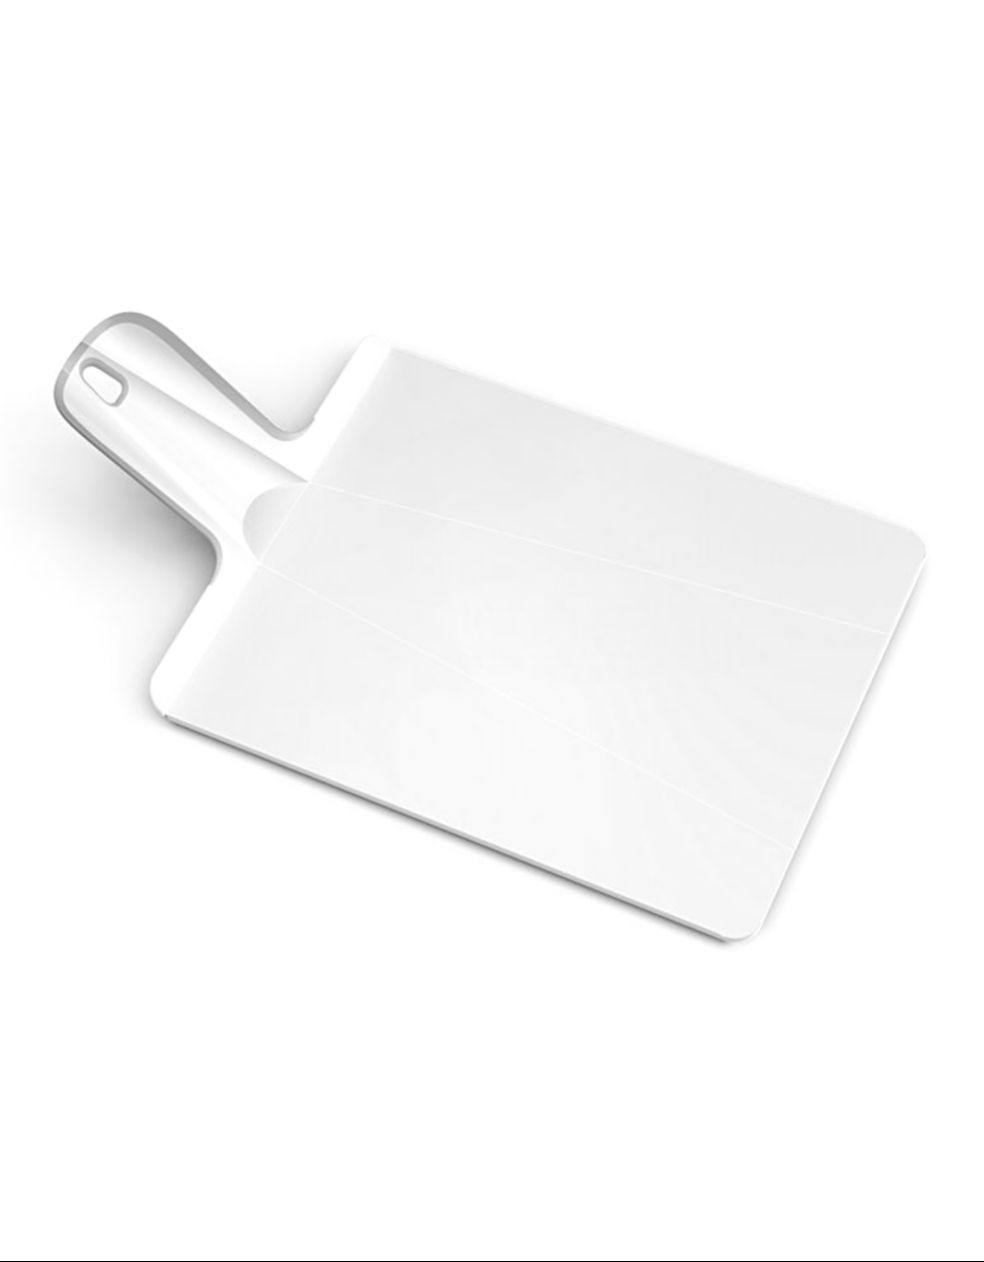 Joseph Joseph Chop2Pot Folding Chopping  Board - White